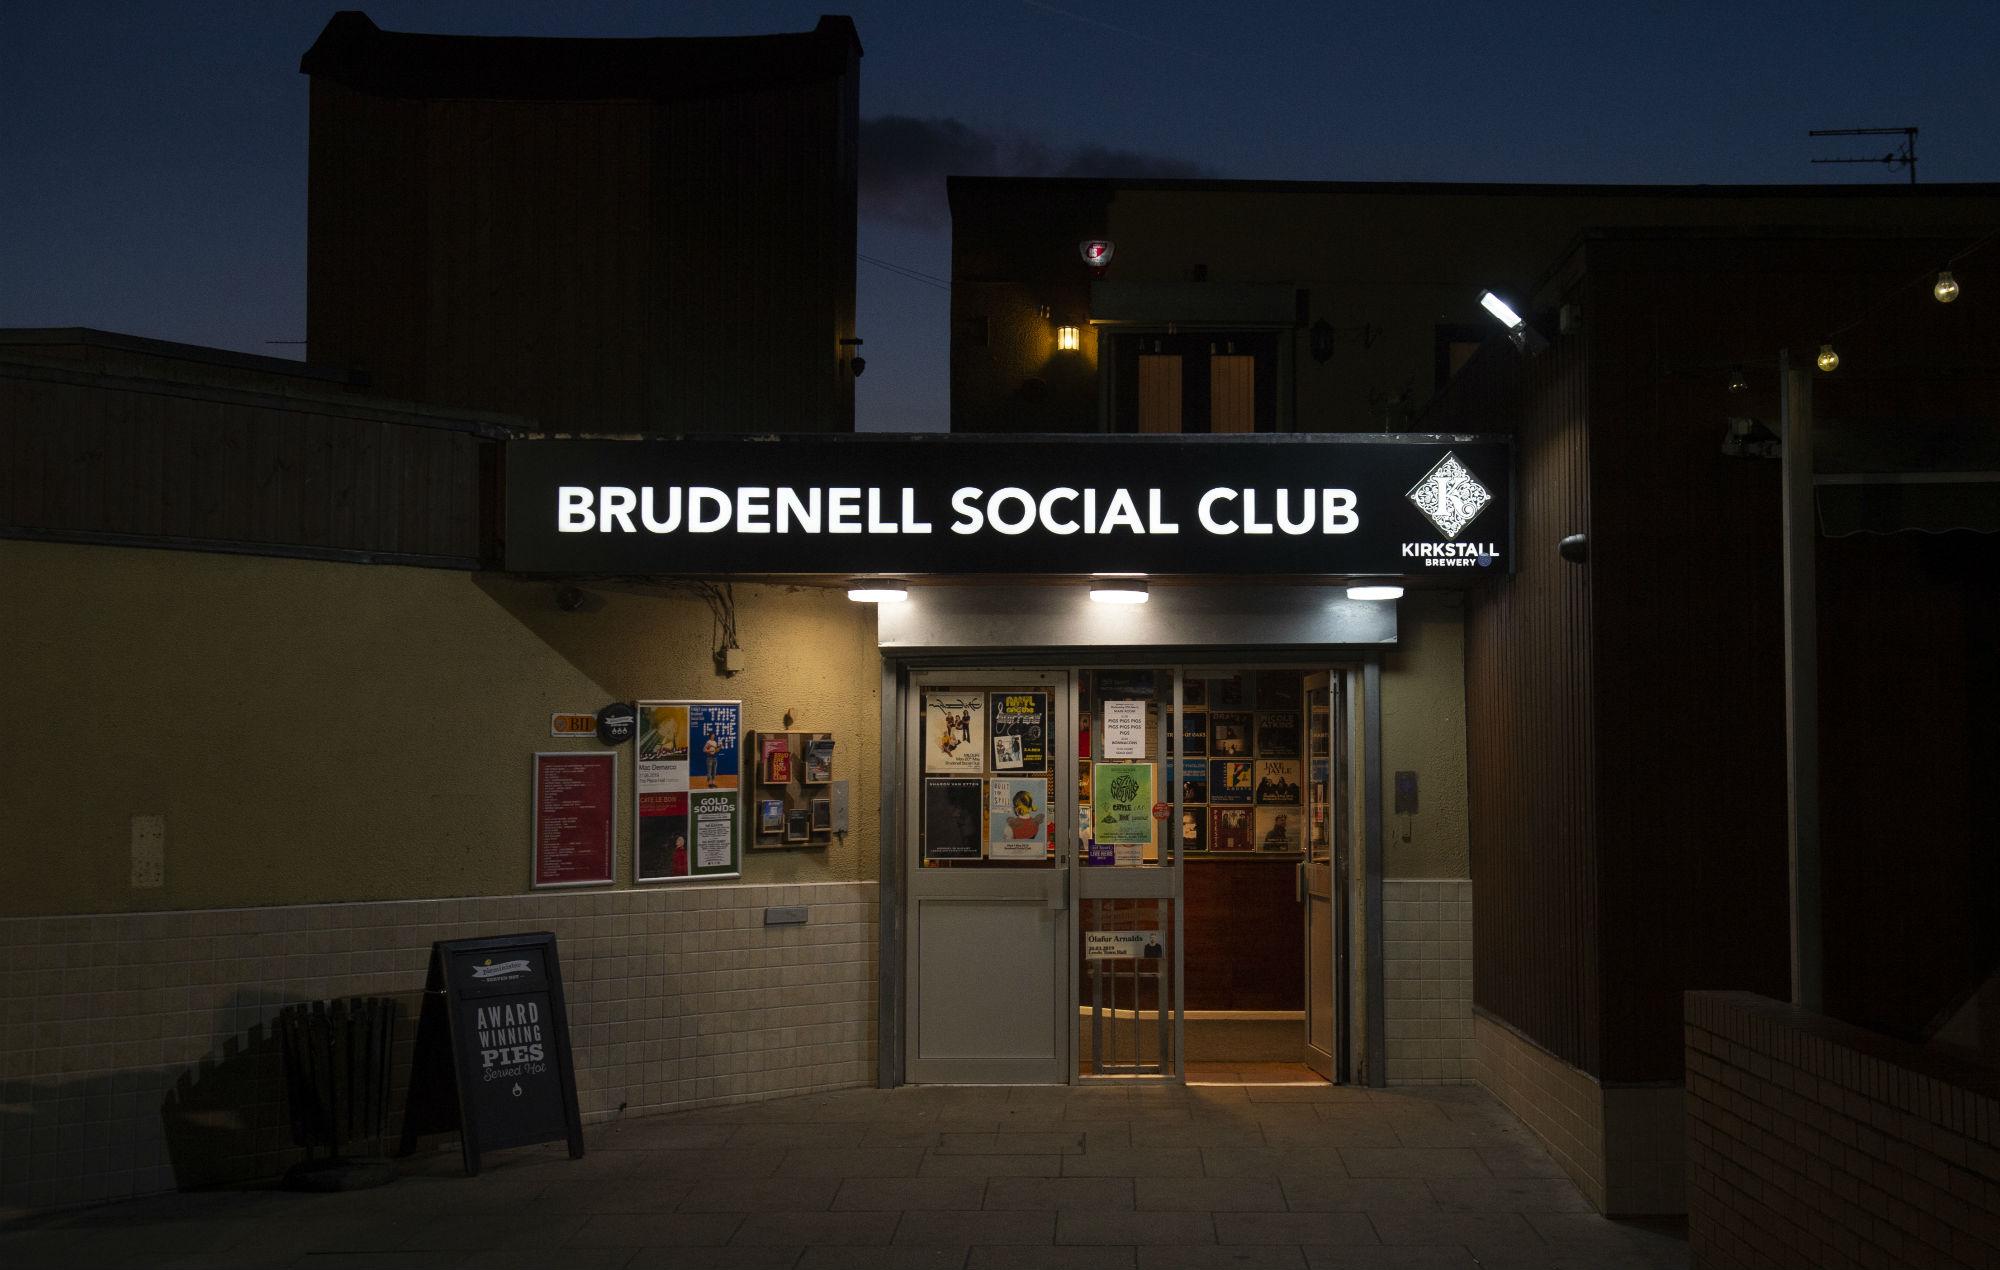 The Brudenell Social Club, Leeds